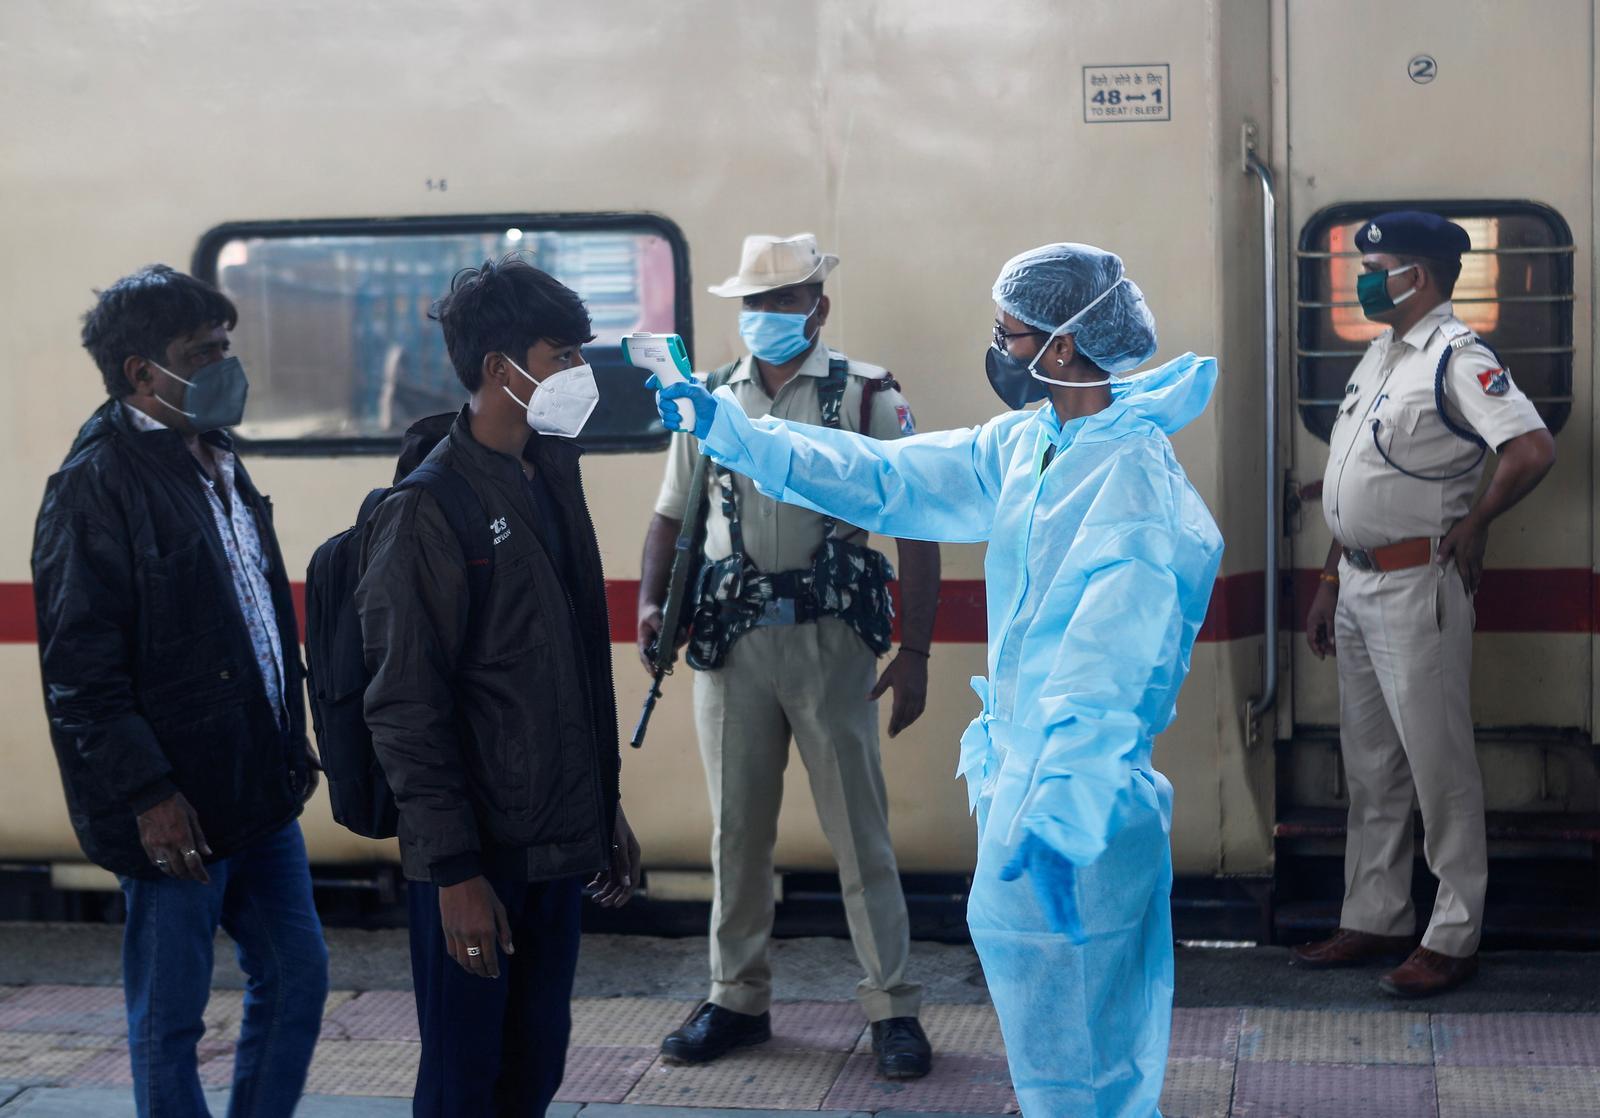 India hits 10 million coronavirus cases but pace slows